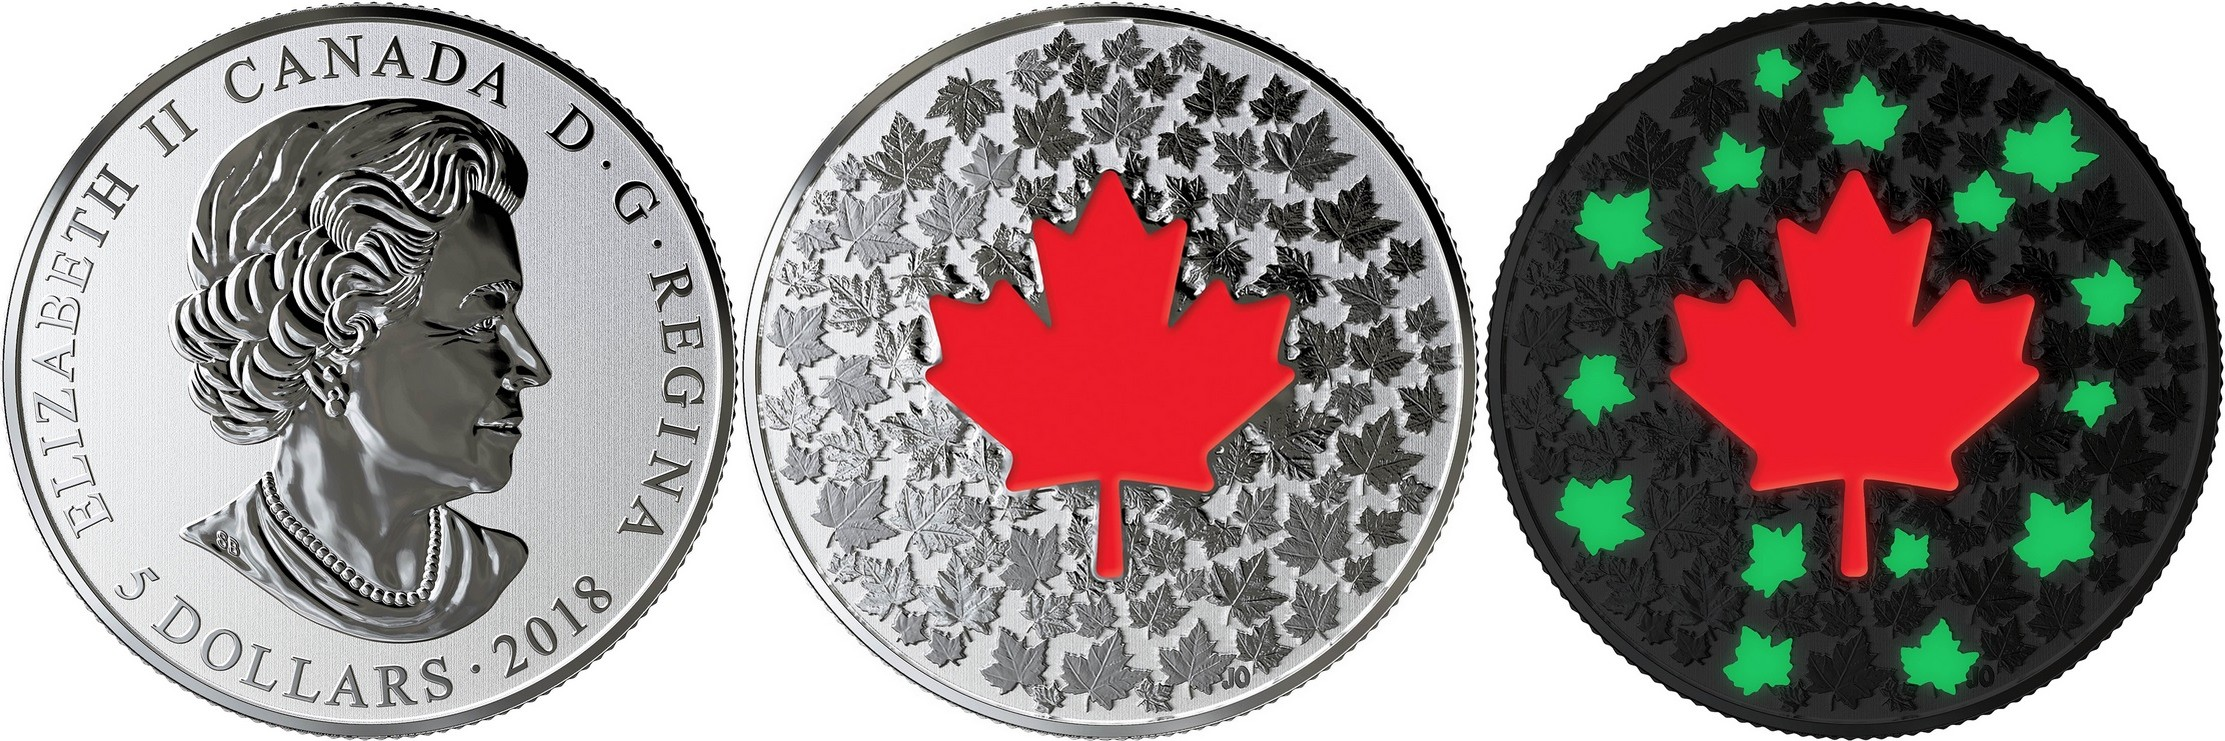 canada 2018 un pays rayonnant